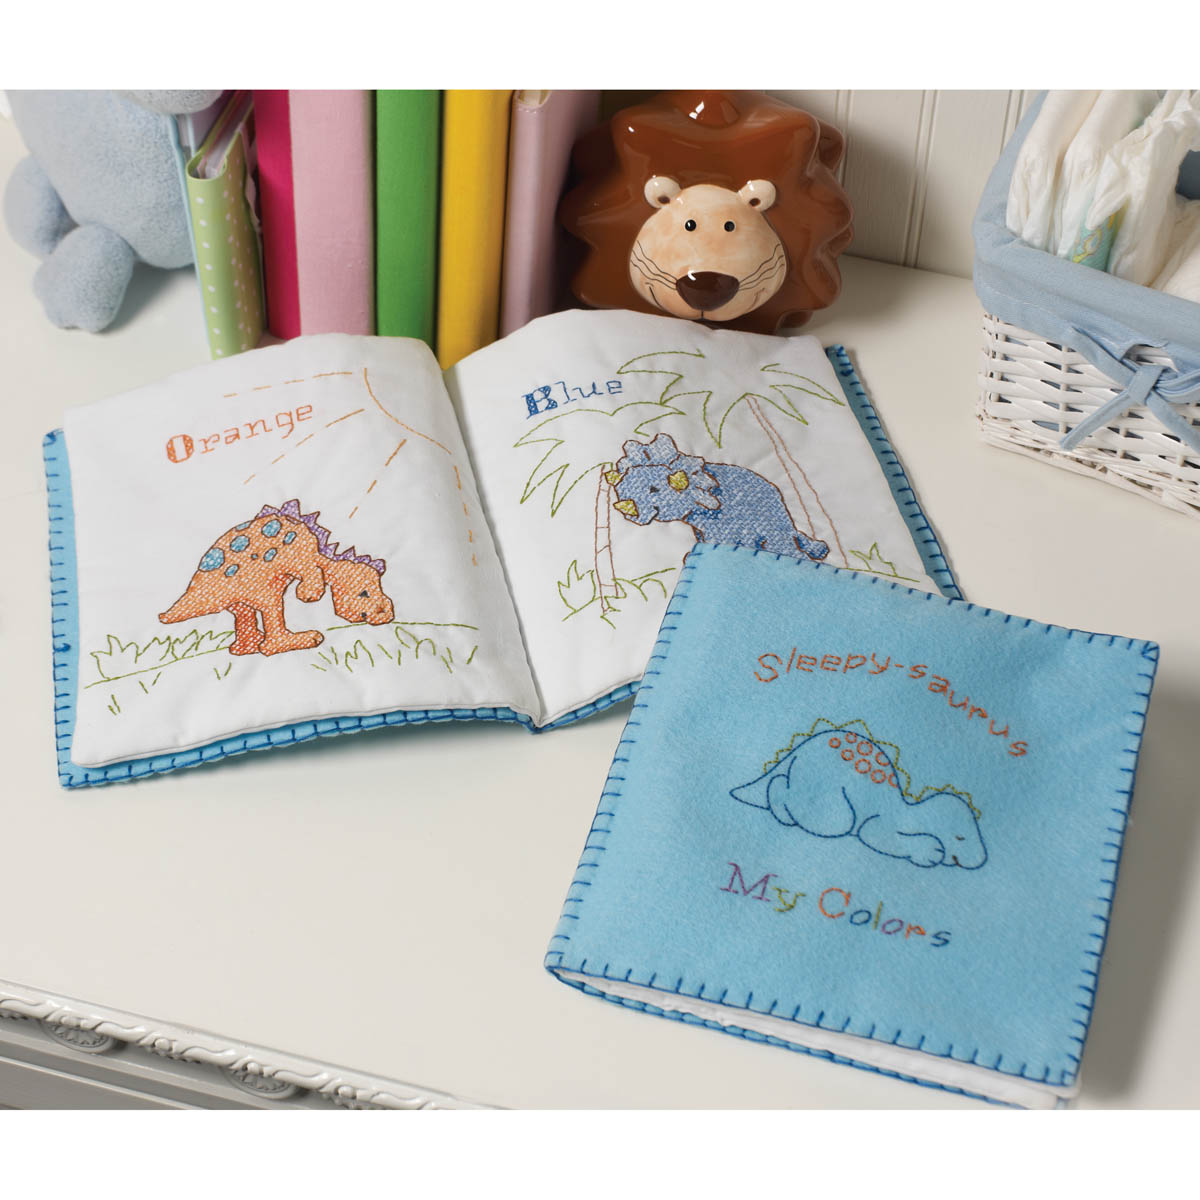 Bucilla ® Baby - Stamped Cross Stitch - Crib Ensembles - Cute-A-Saurus - Quiet Book